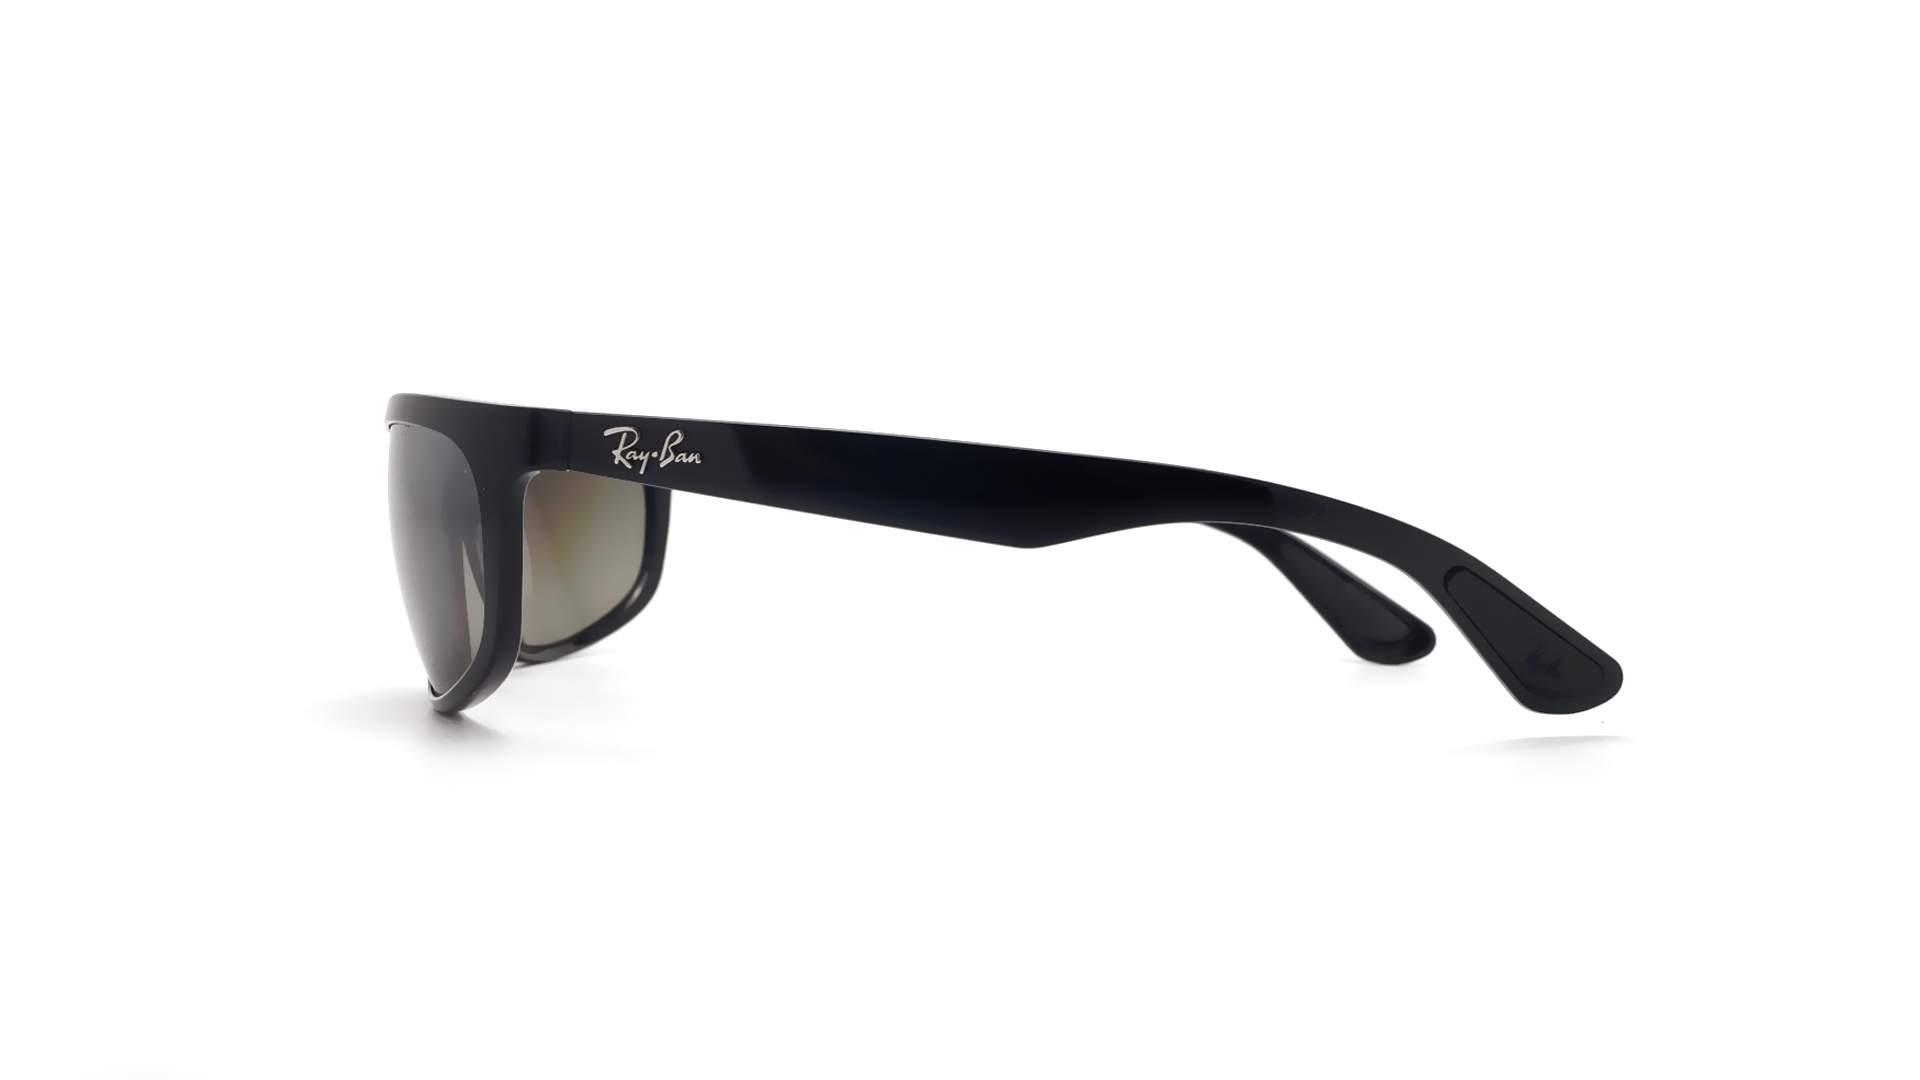 20ce487f60 Sunglasses Ray-Ban Tech Black Chromance RB4265 601 5J 62-19 Large Polarized  Mirror